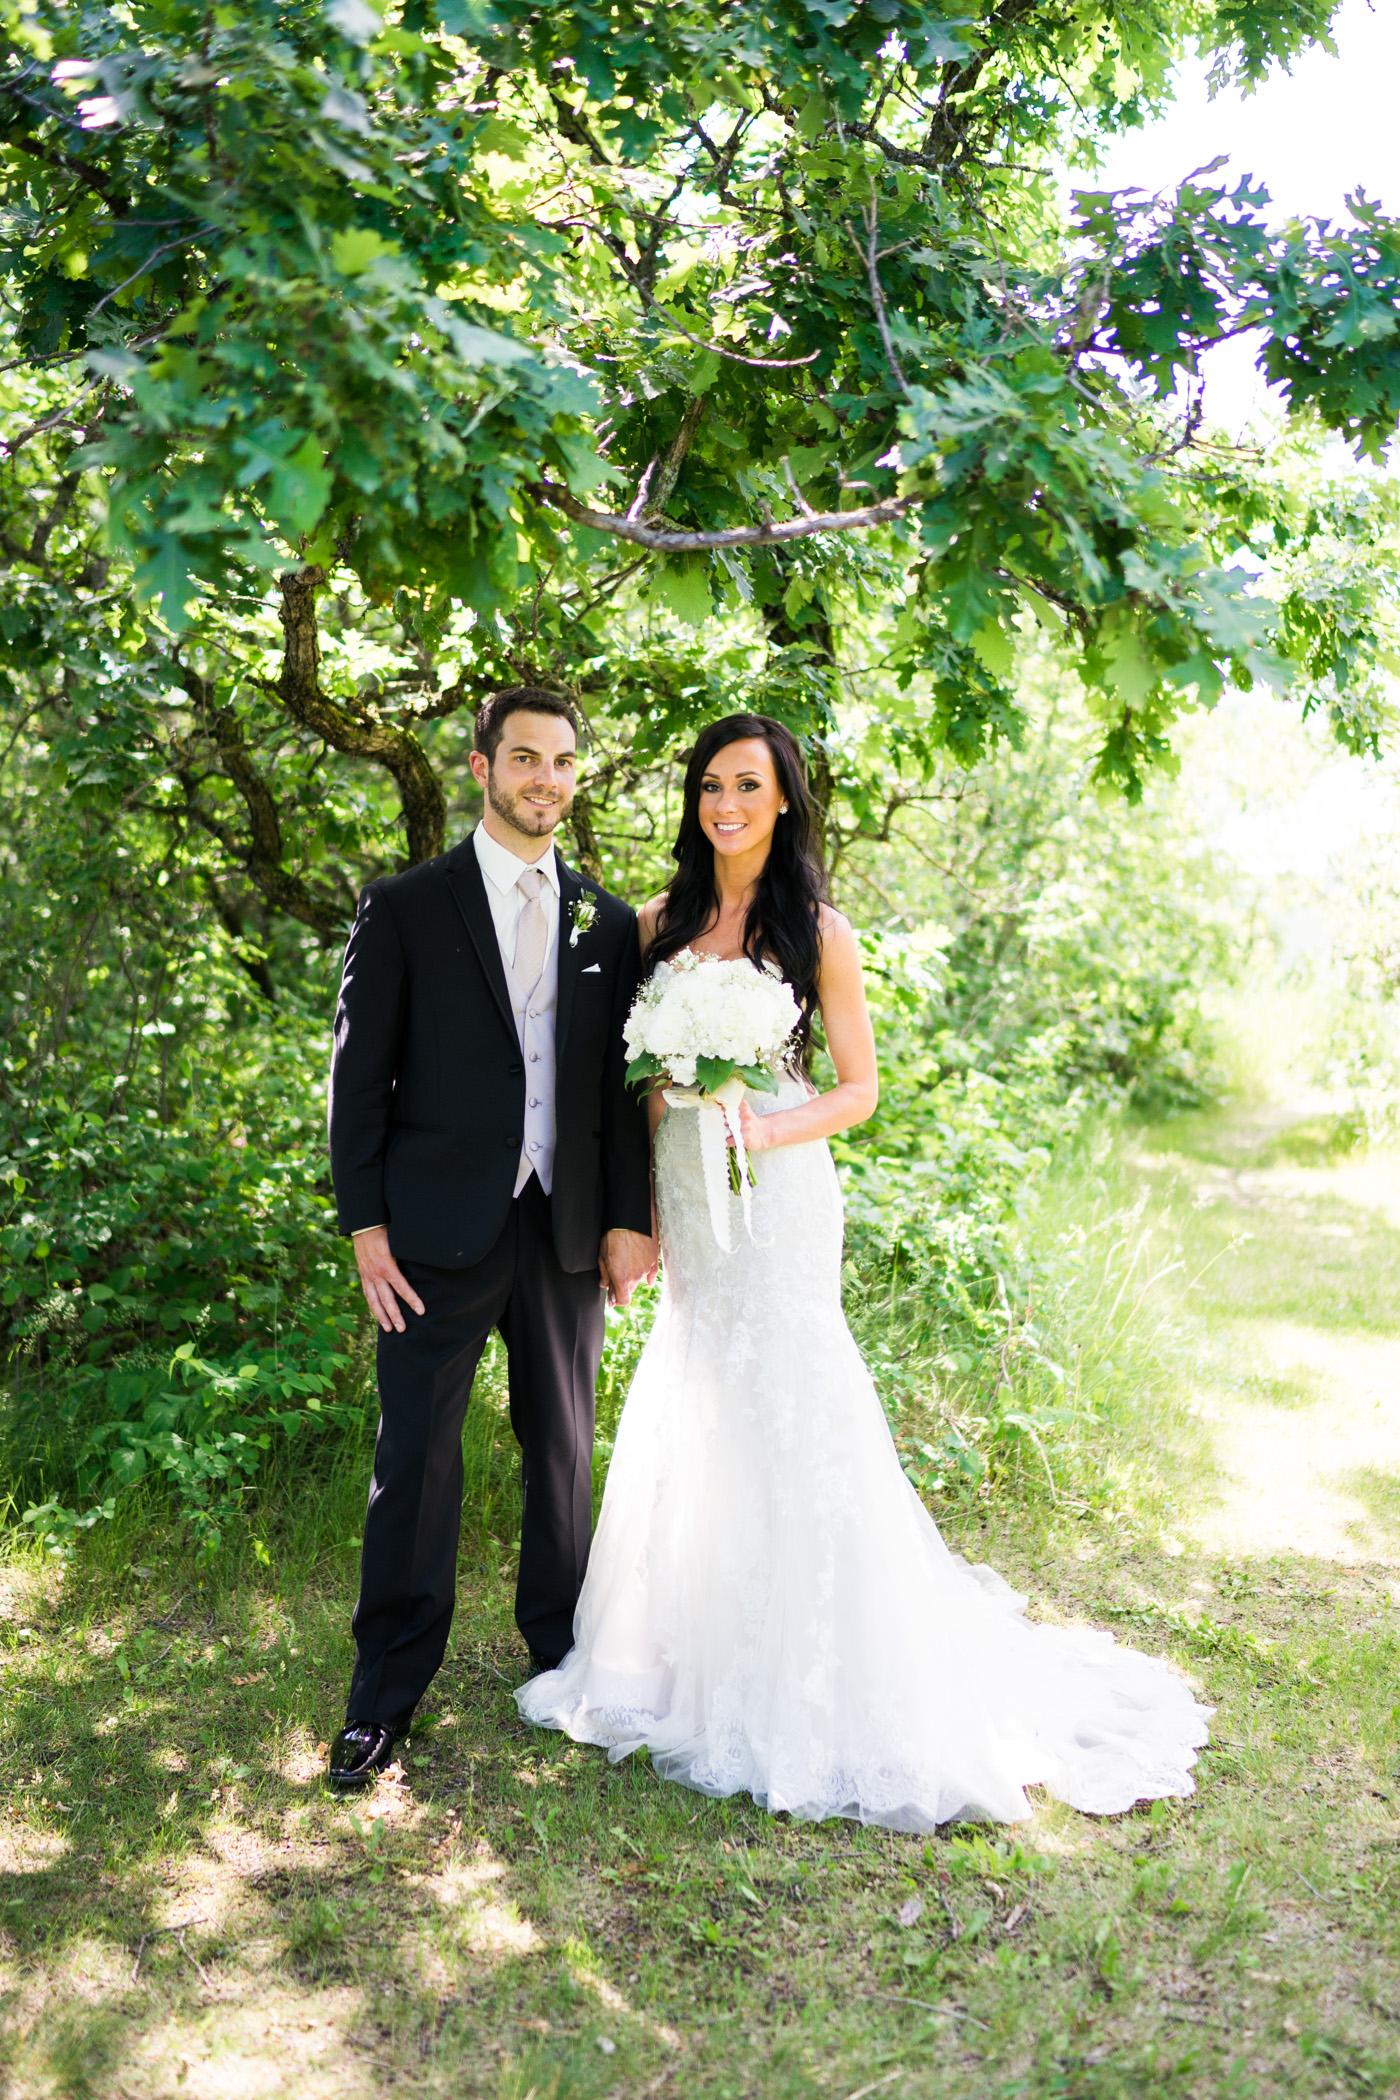 Hillary and Mark - Pineridge Hollow Wedding - Cojo Photo-1211.jpg